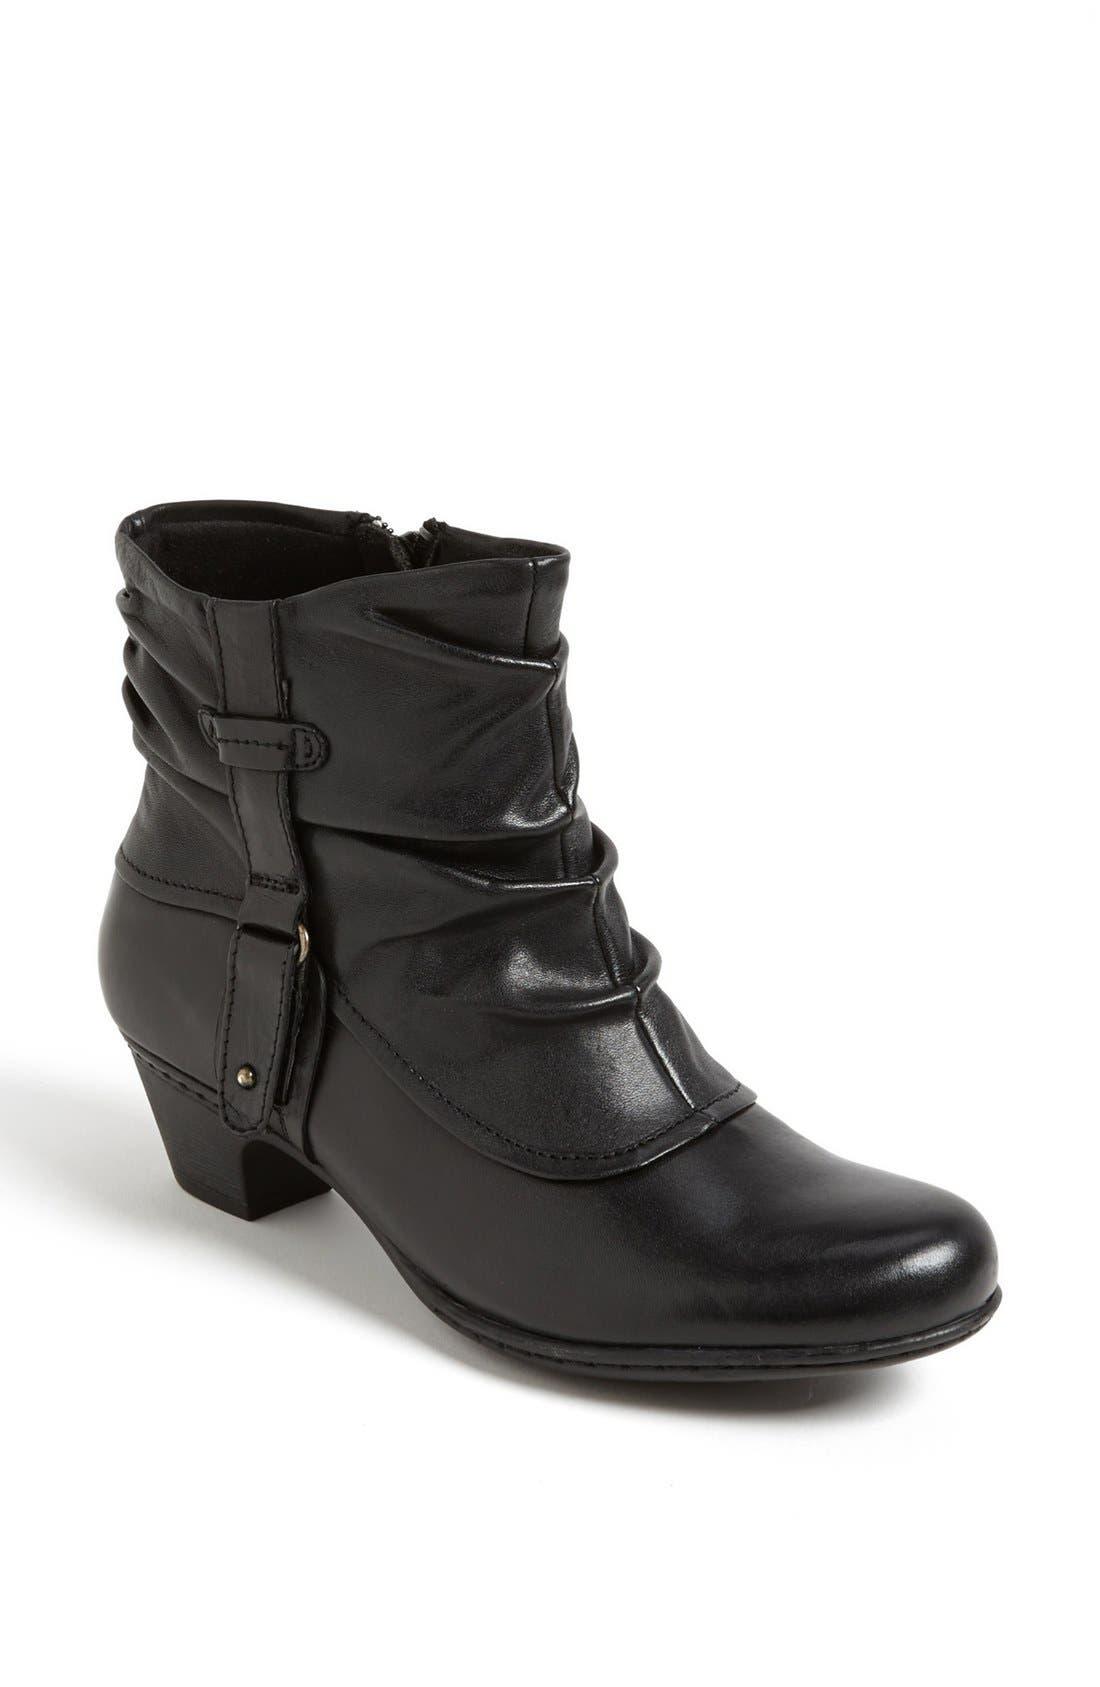 Alternate Image 1 Selected - Rockport Cobb Hill 'Alexandra' Boot